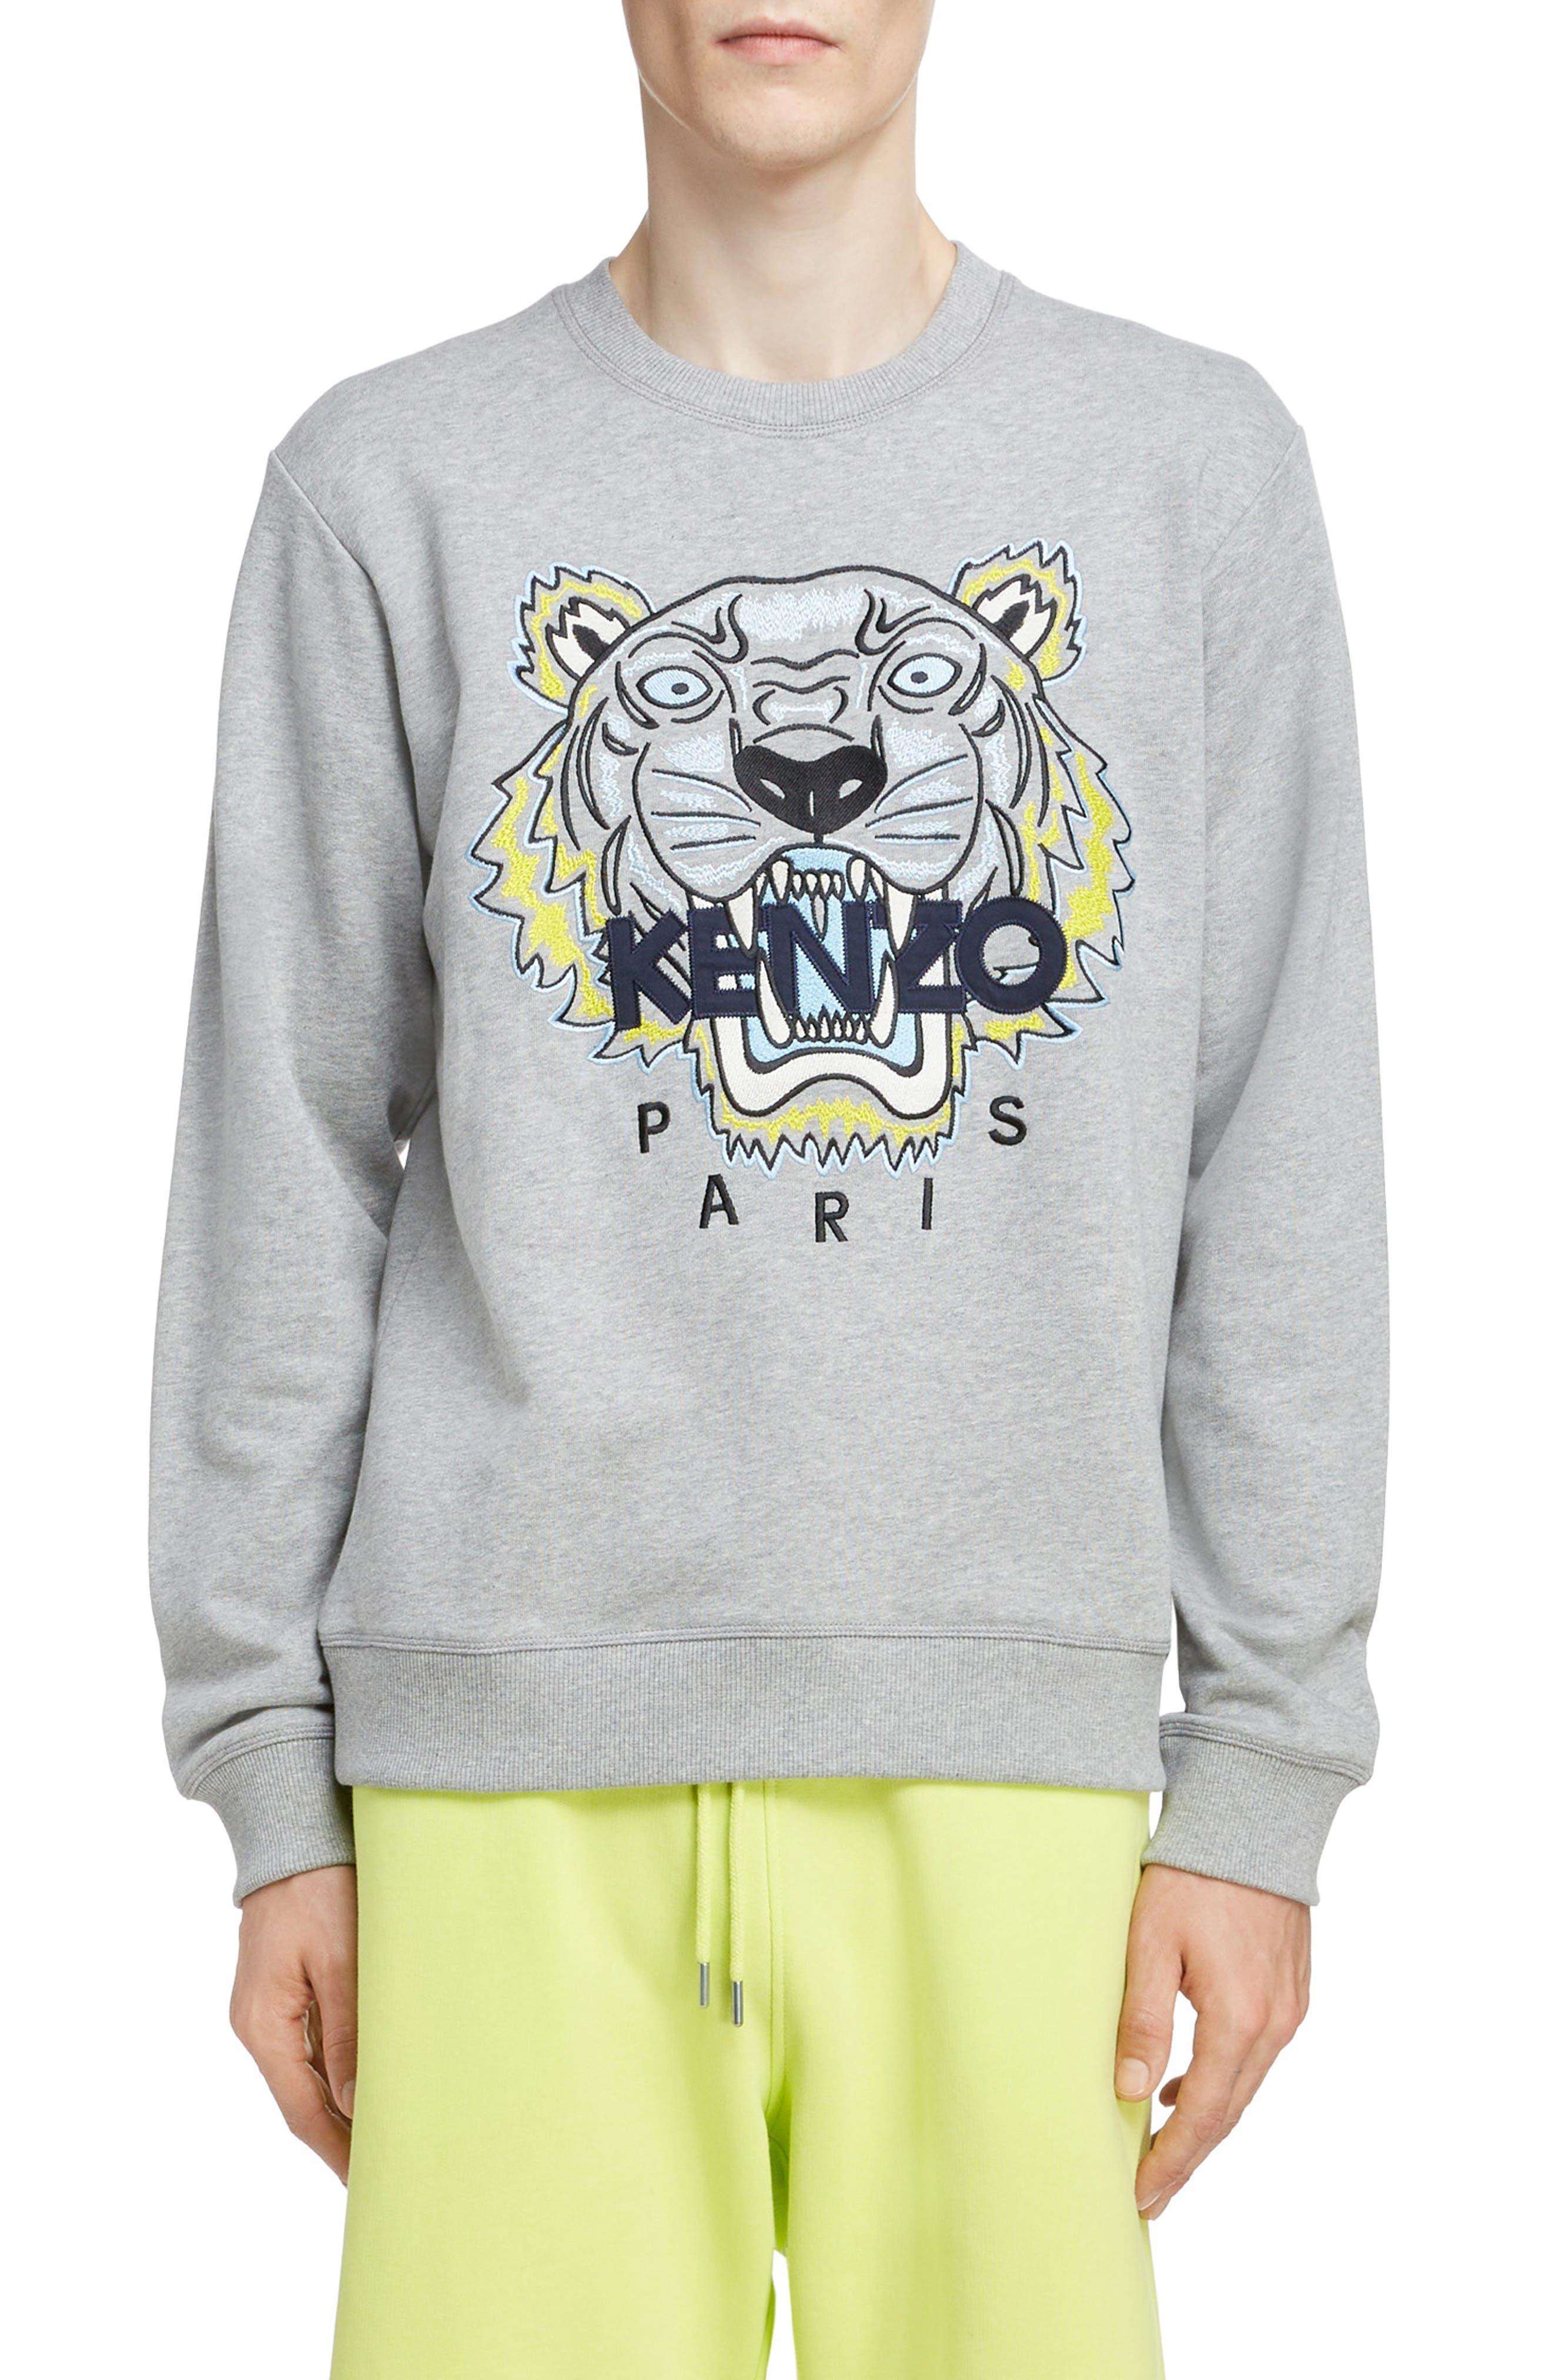 KENZO, Tiger Sweatshirt, Main thumbnail 1, color, PEARL GREY